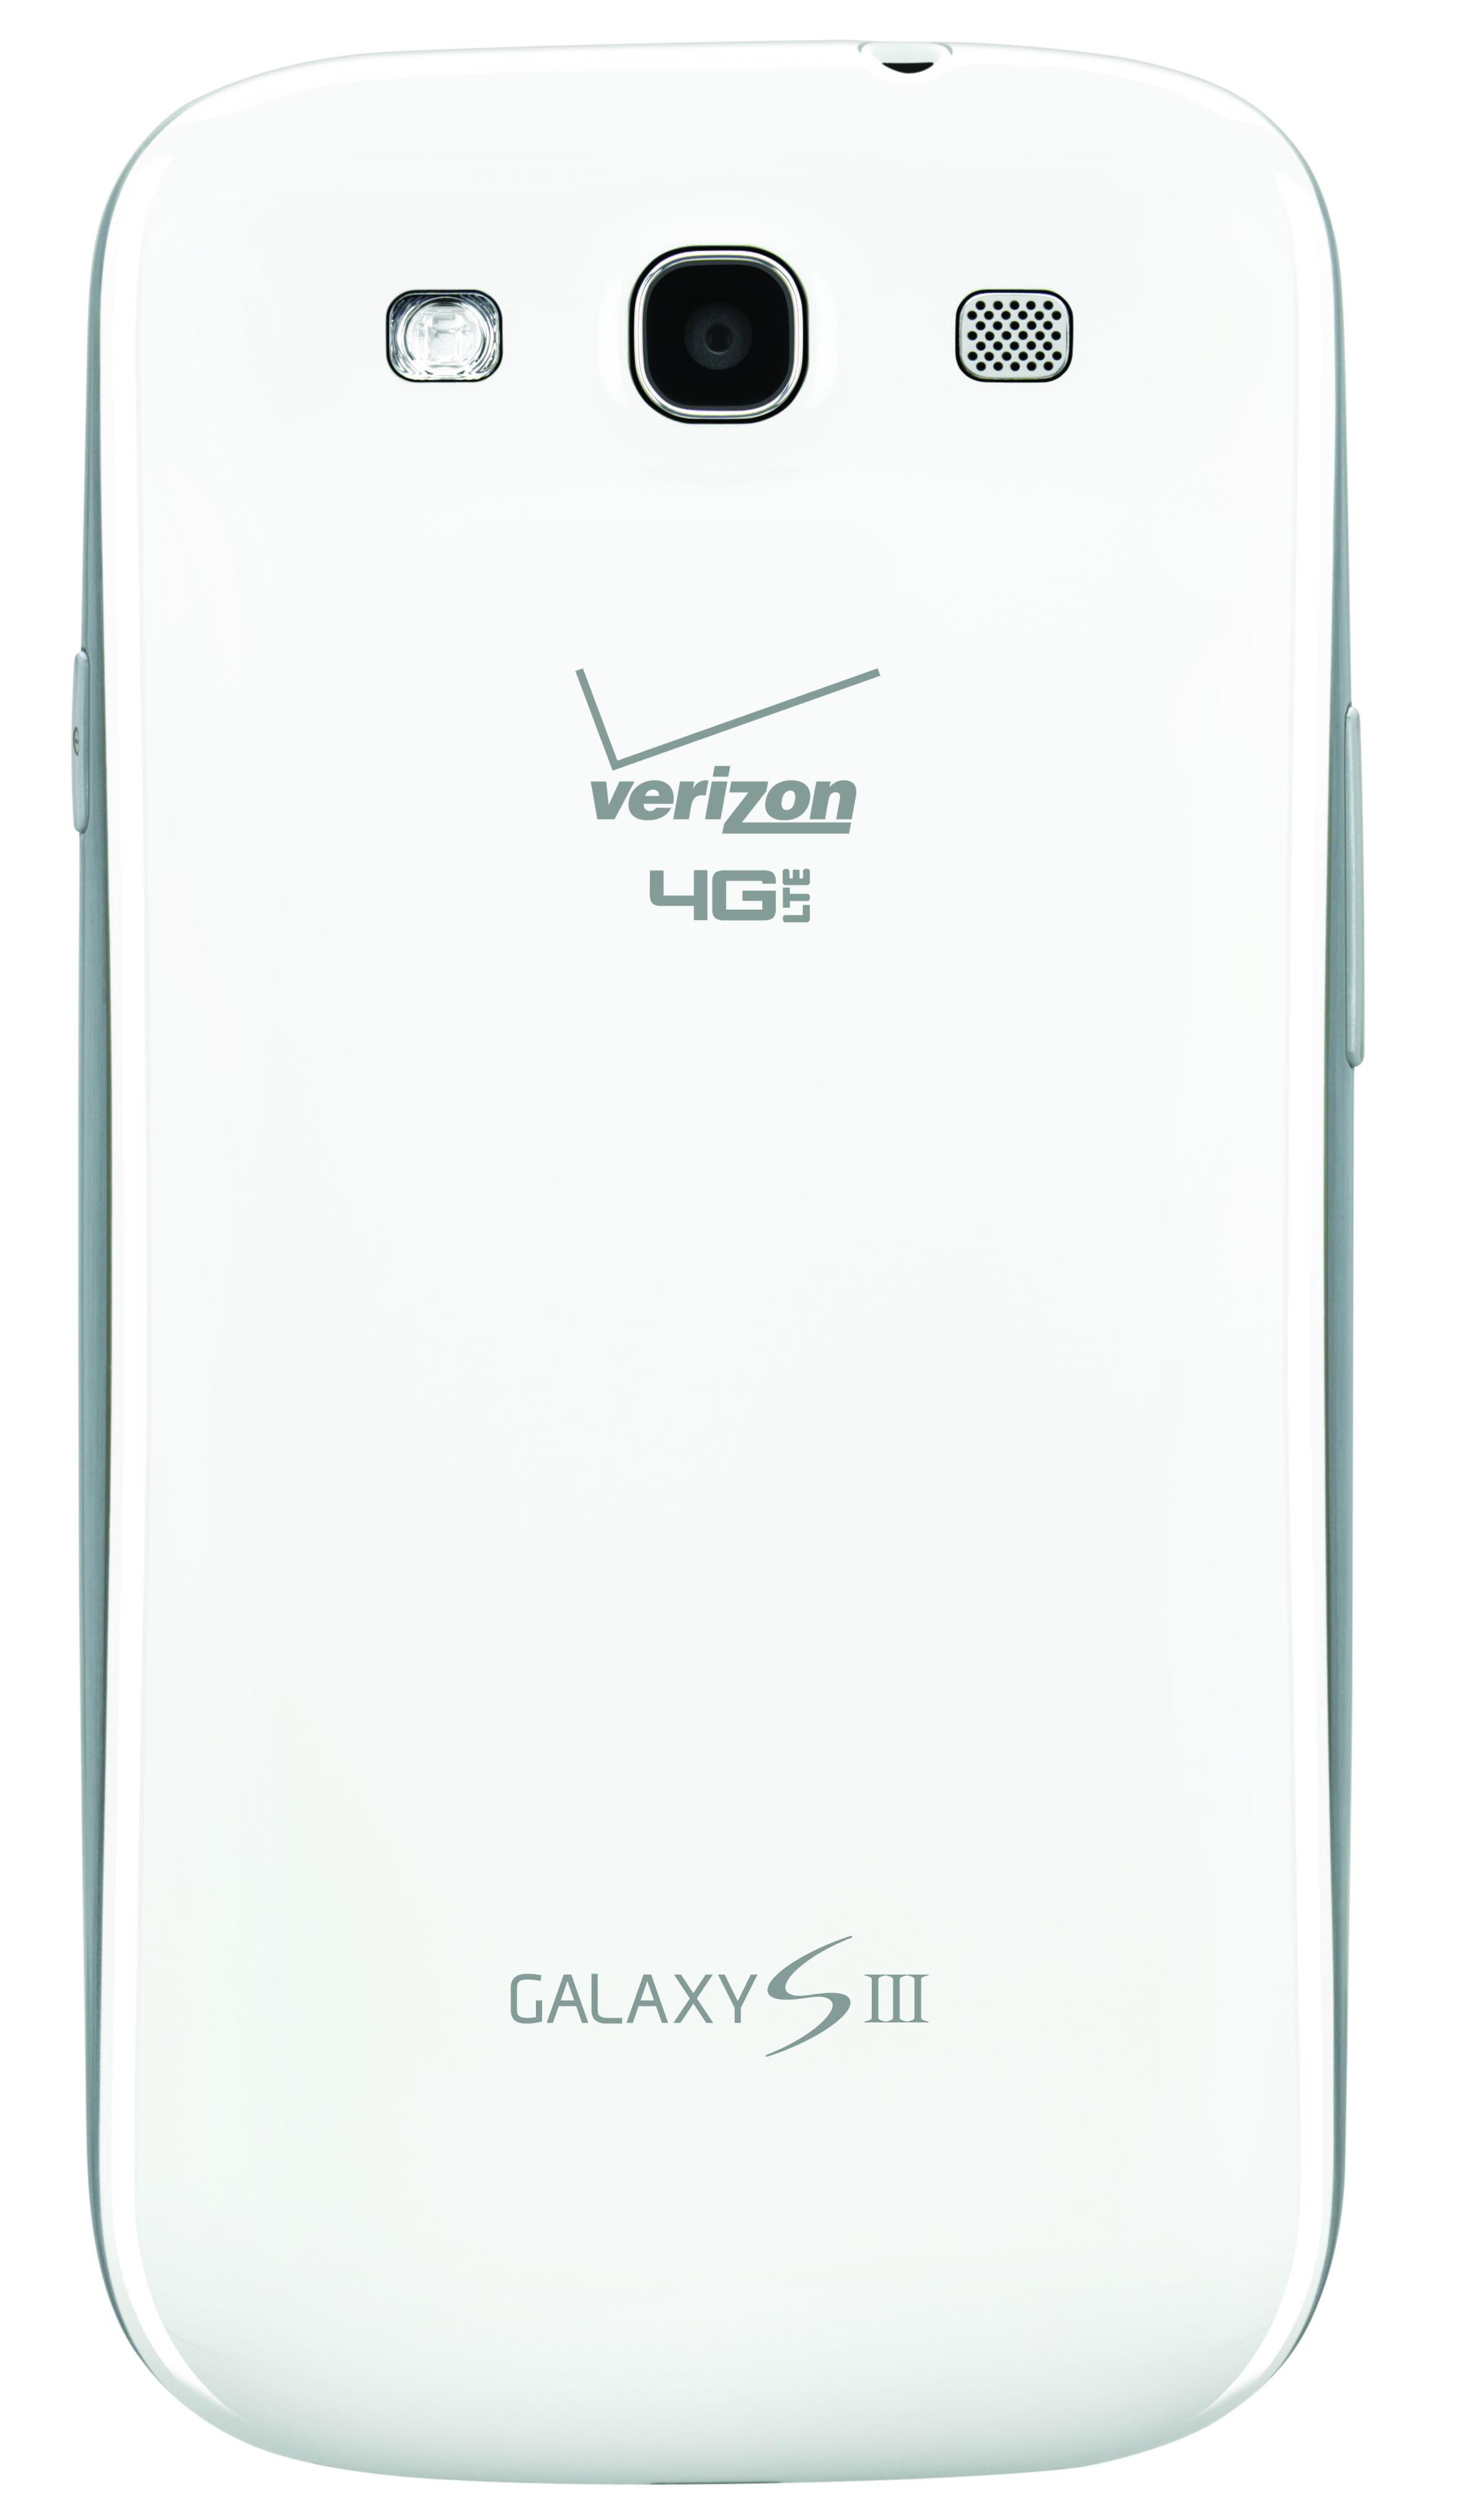 Samsung galaxy battery s3 verizon - Samsung Galaxy Battery S3 Verizon 55